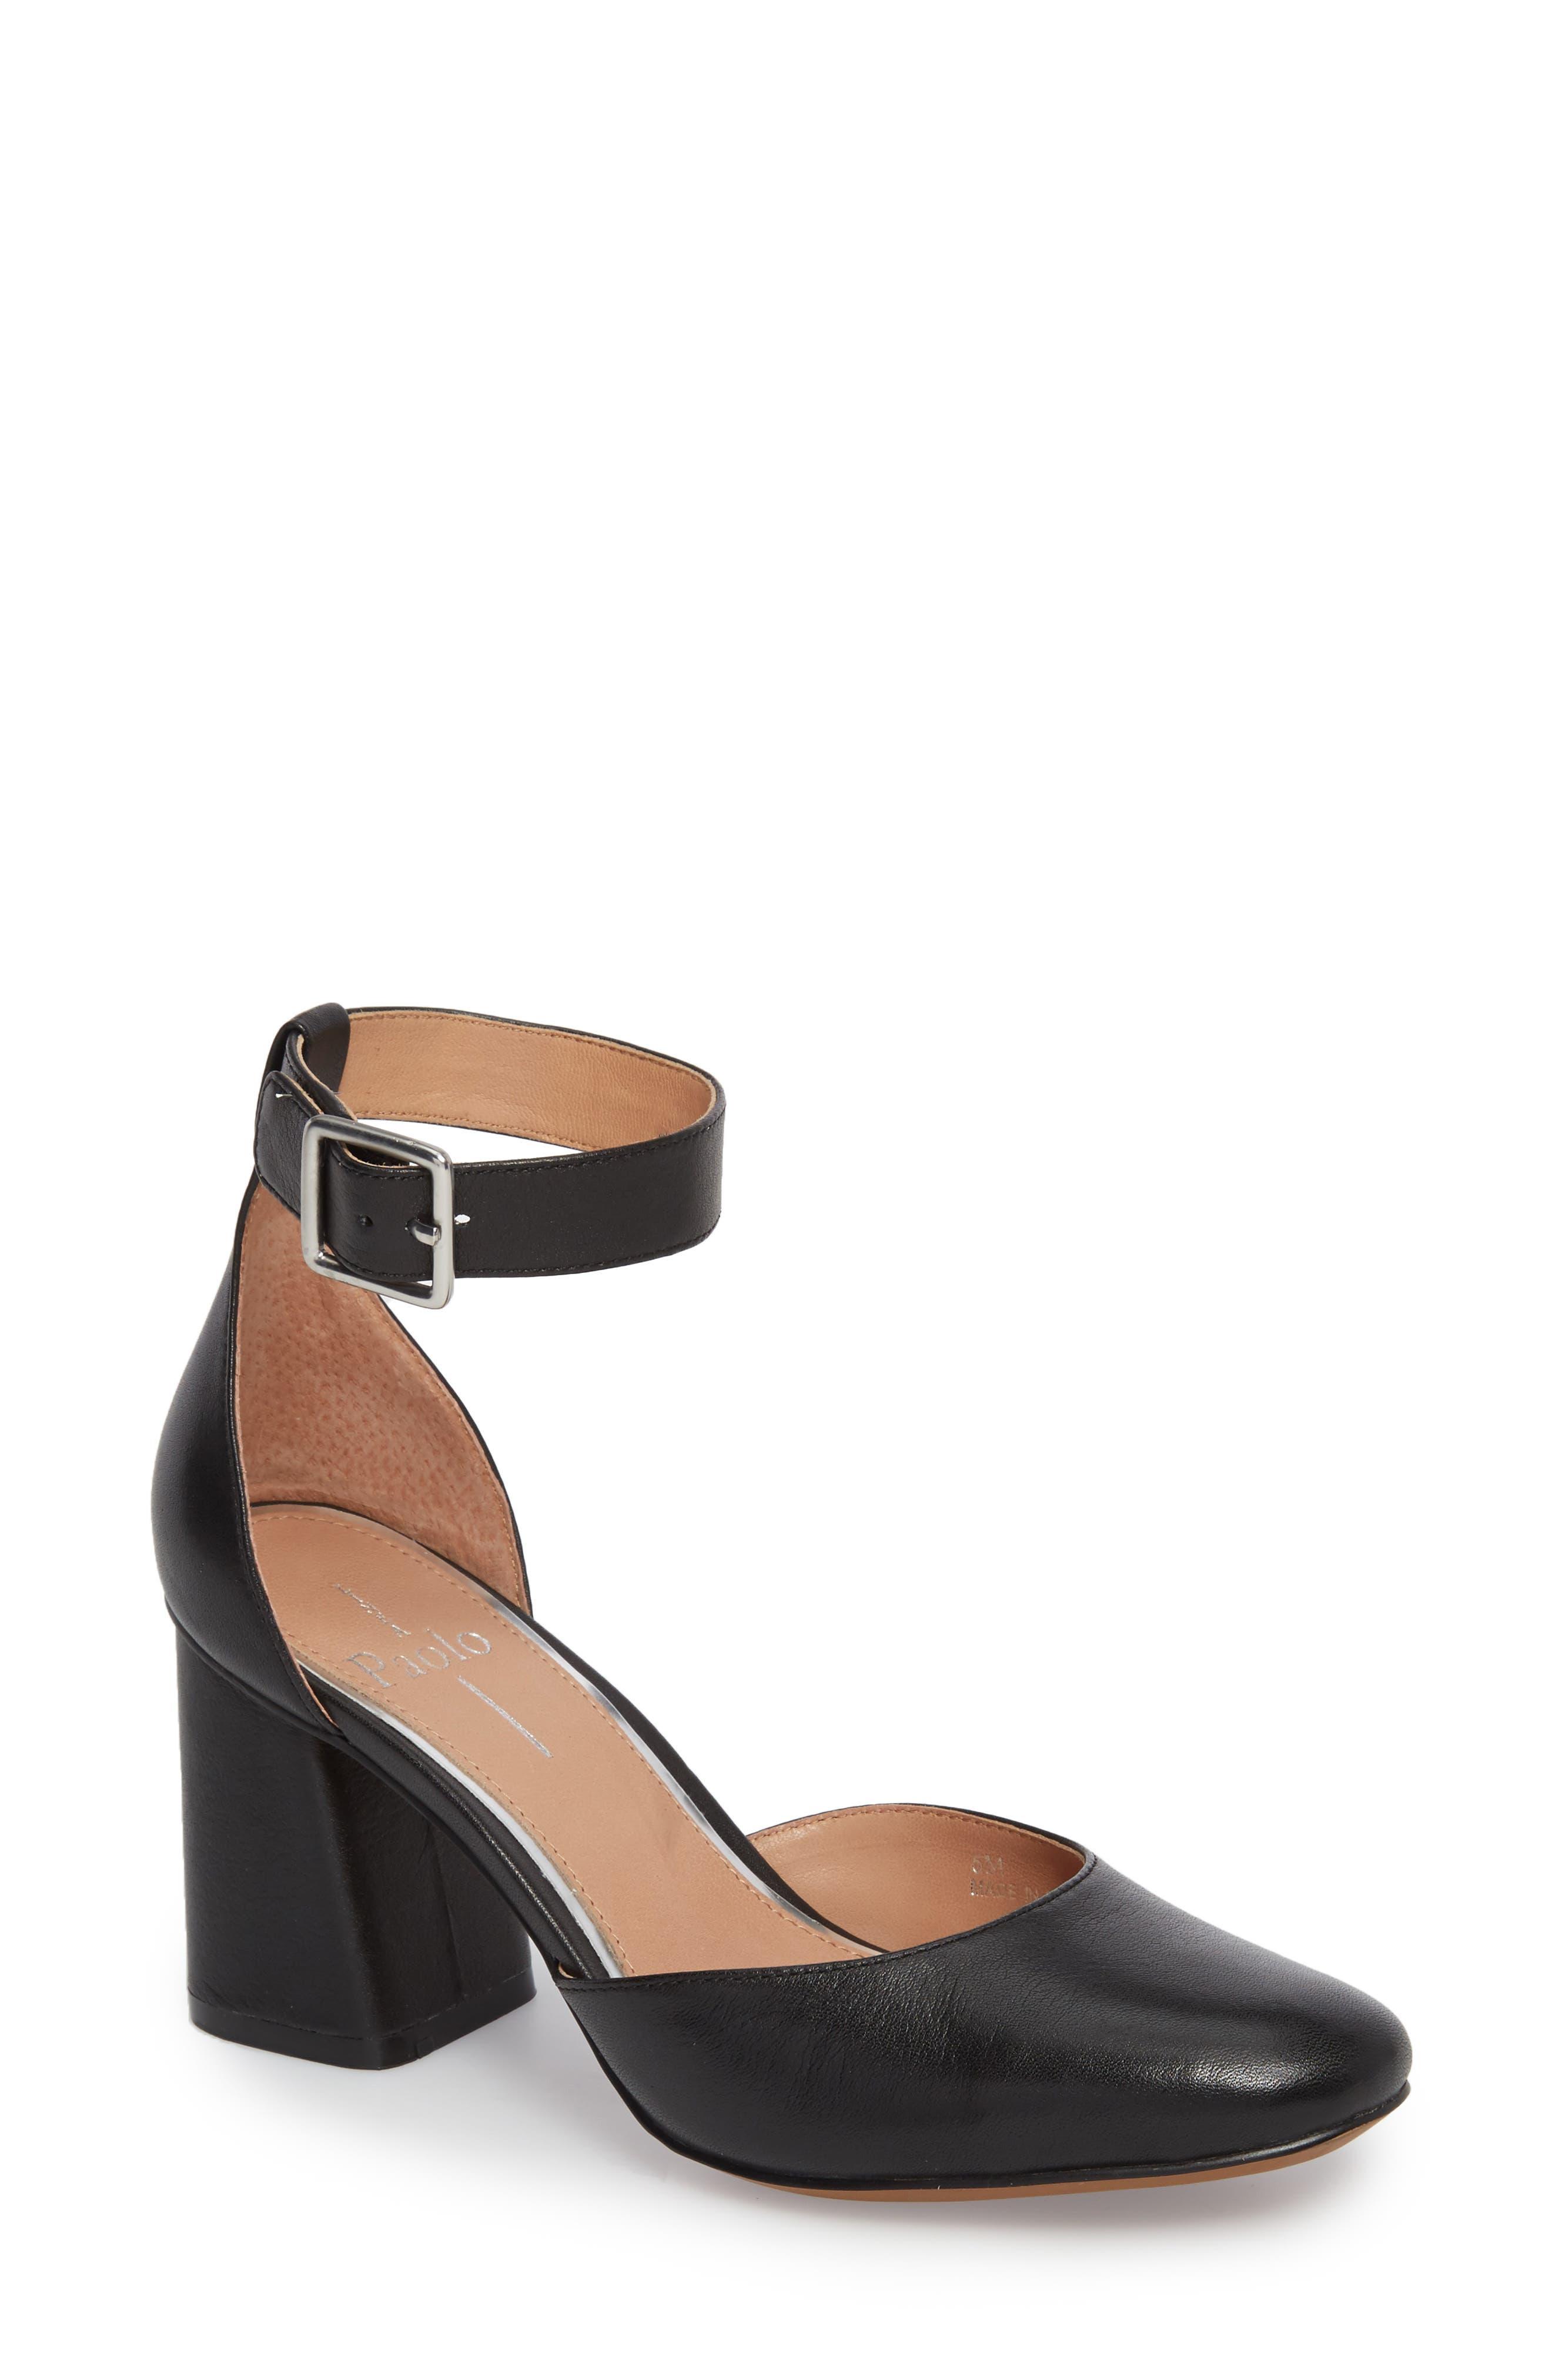 Maya Ankle Strap Pump,                             Main thumbnail 1, color,                             Black Leather